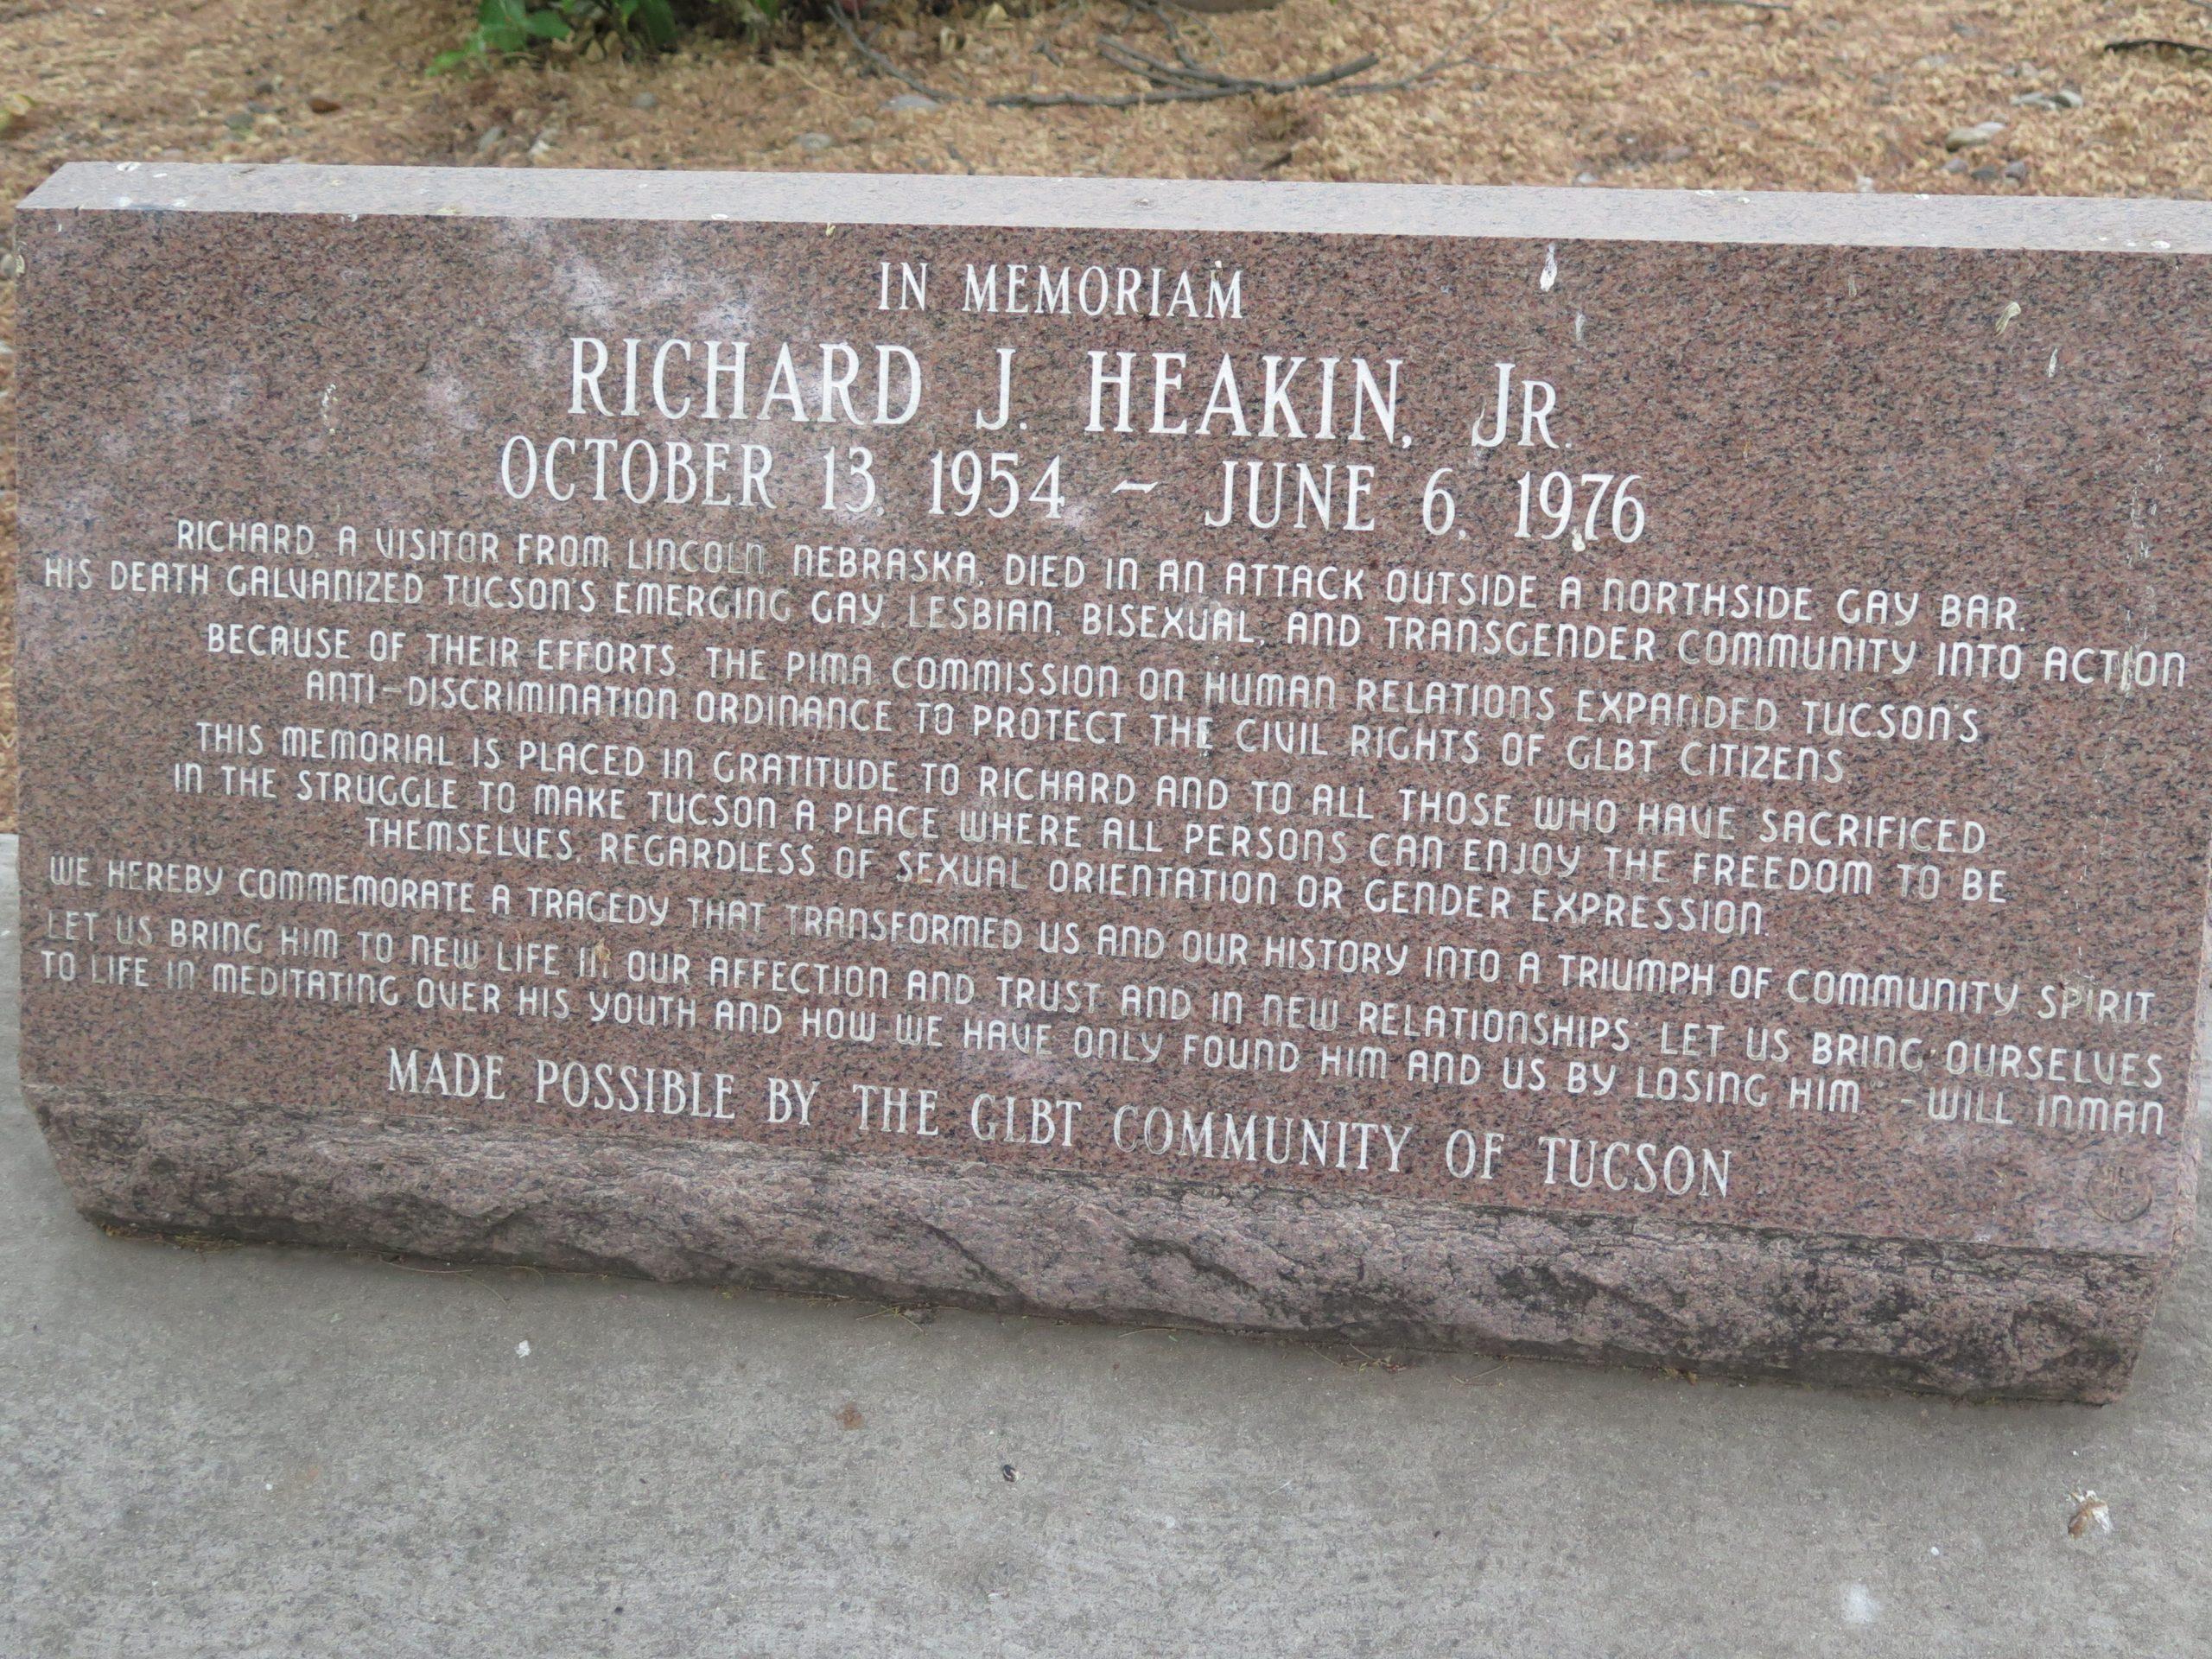 Richard Heakin, Jr., 1954-1976